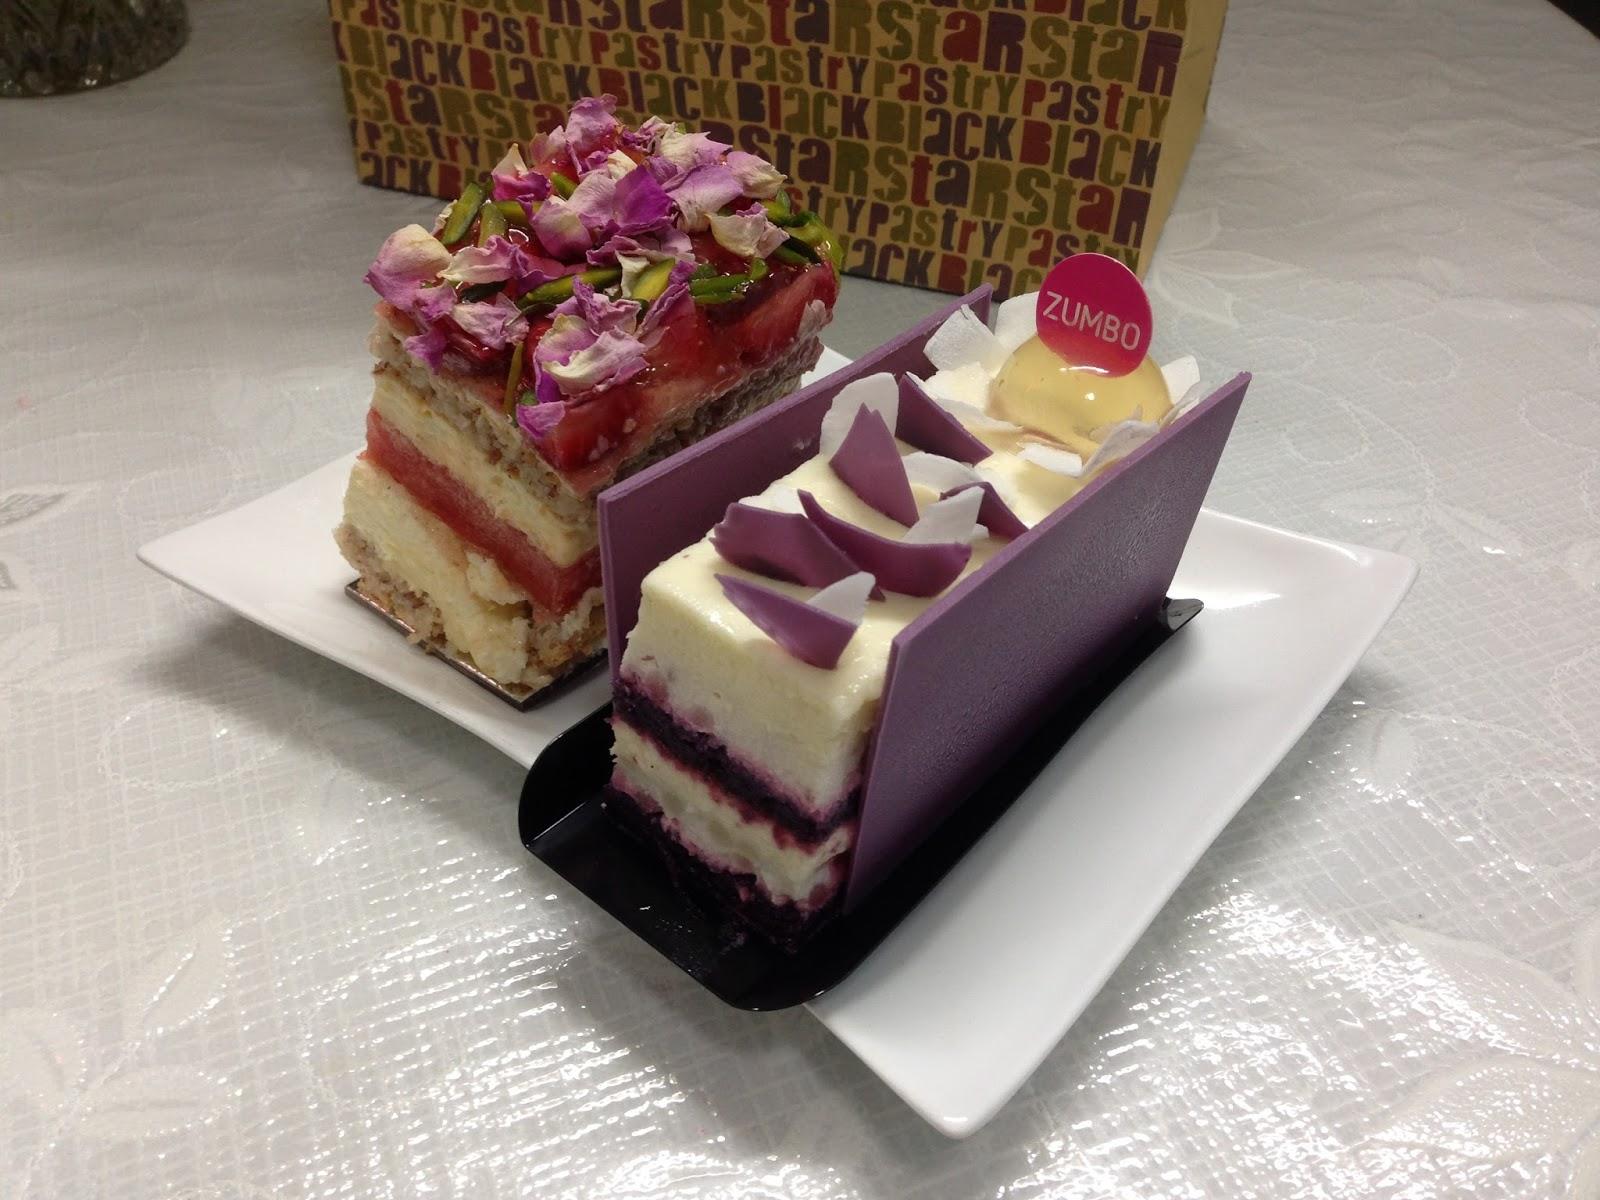 Birthday Cakes Zumbo ~ May 2016 ~ the luong road ahead